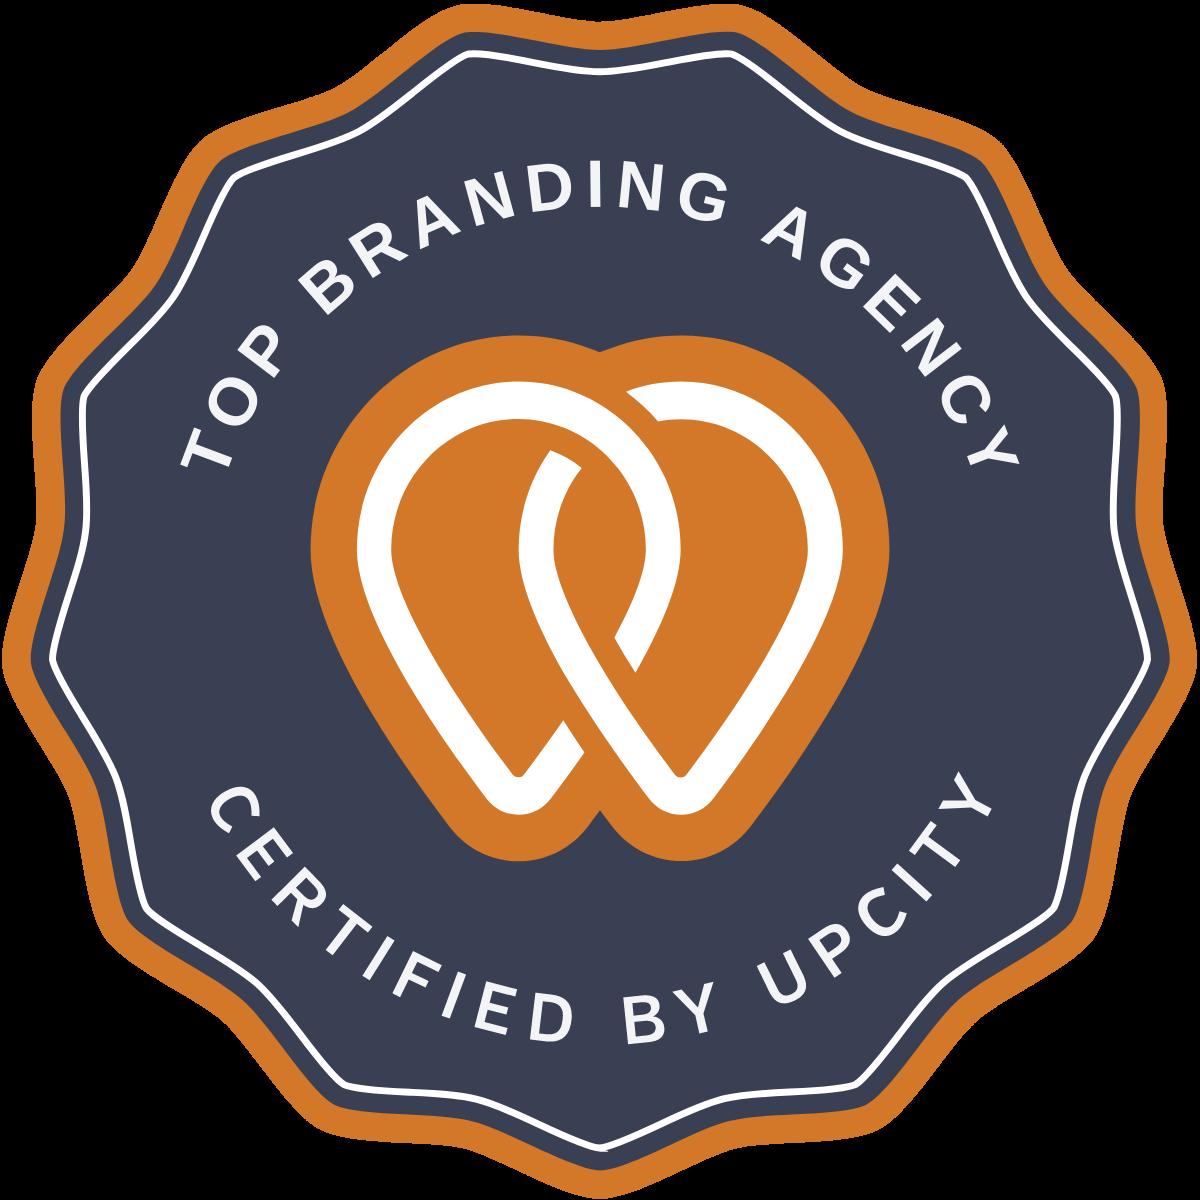 AtticSalt named top phoenix branding agency by Upcity